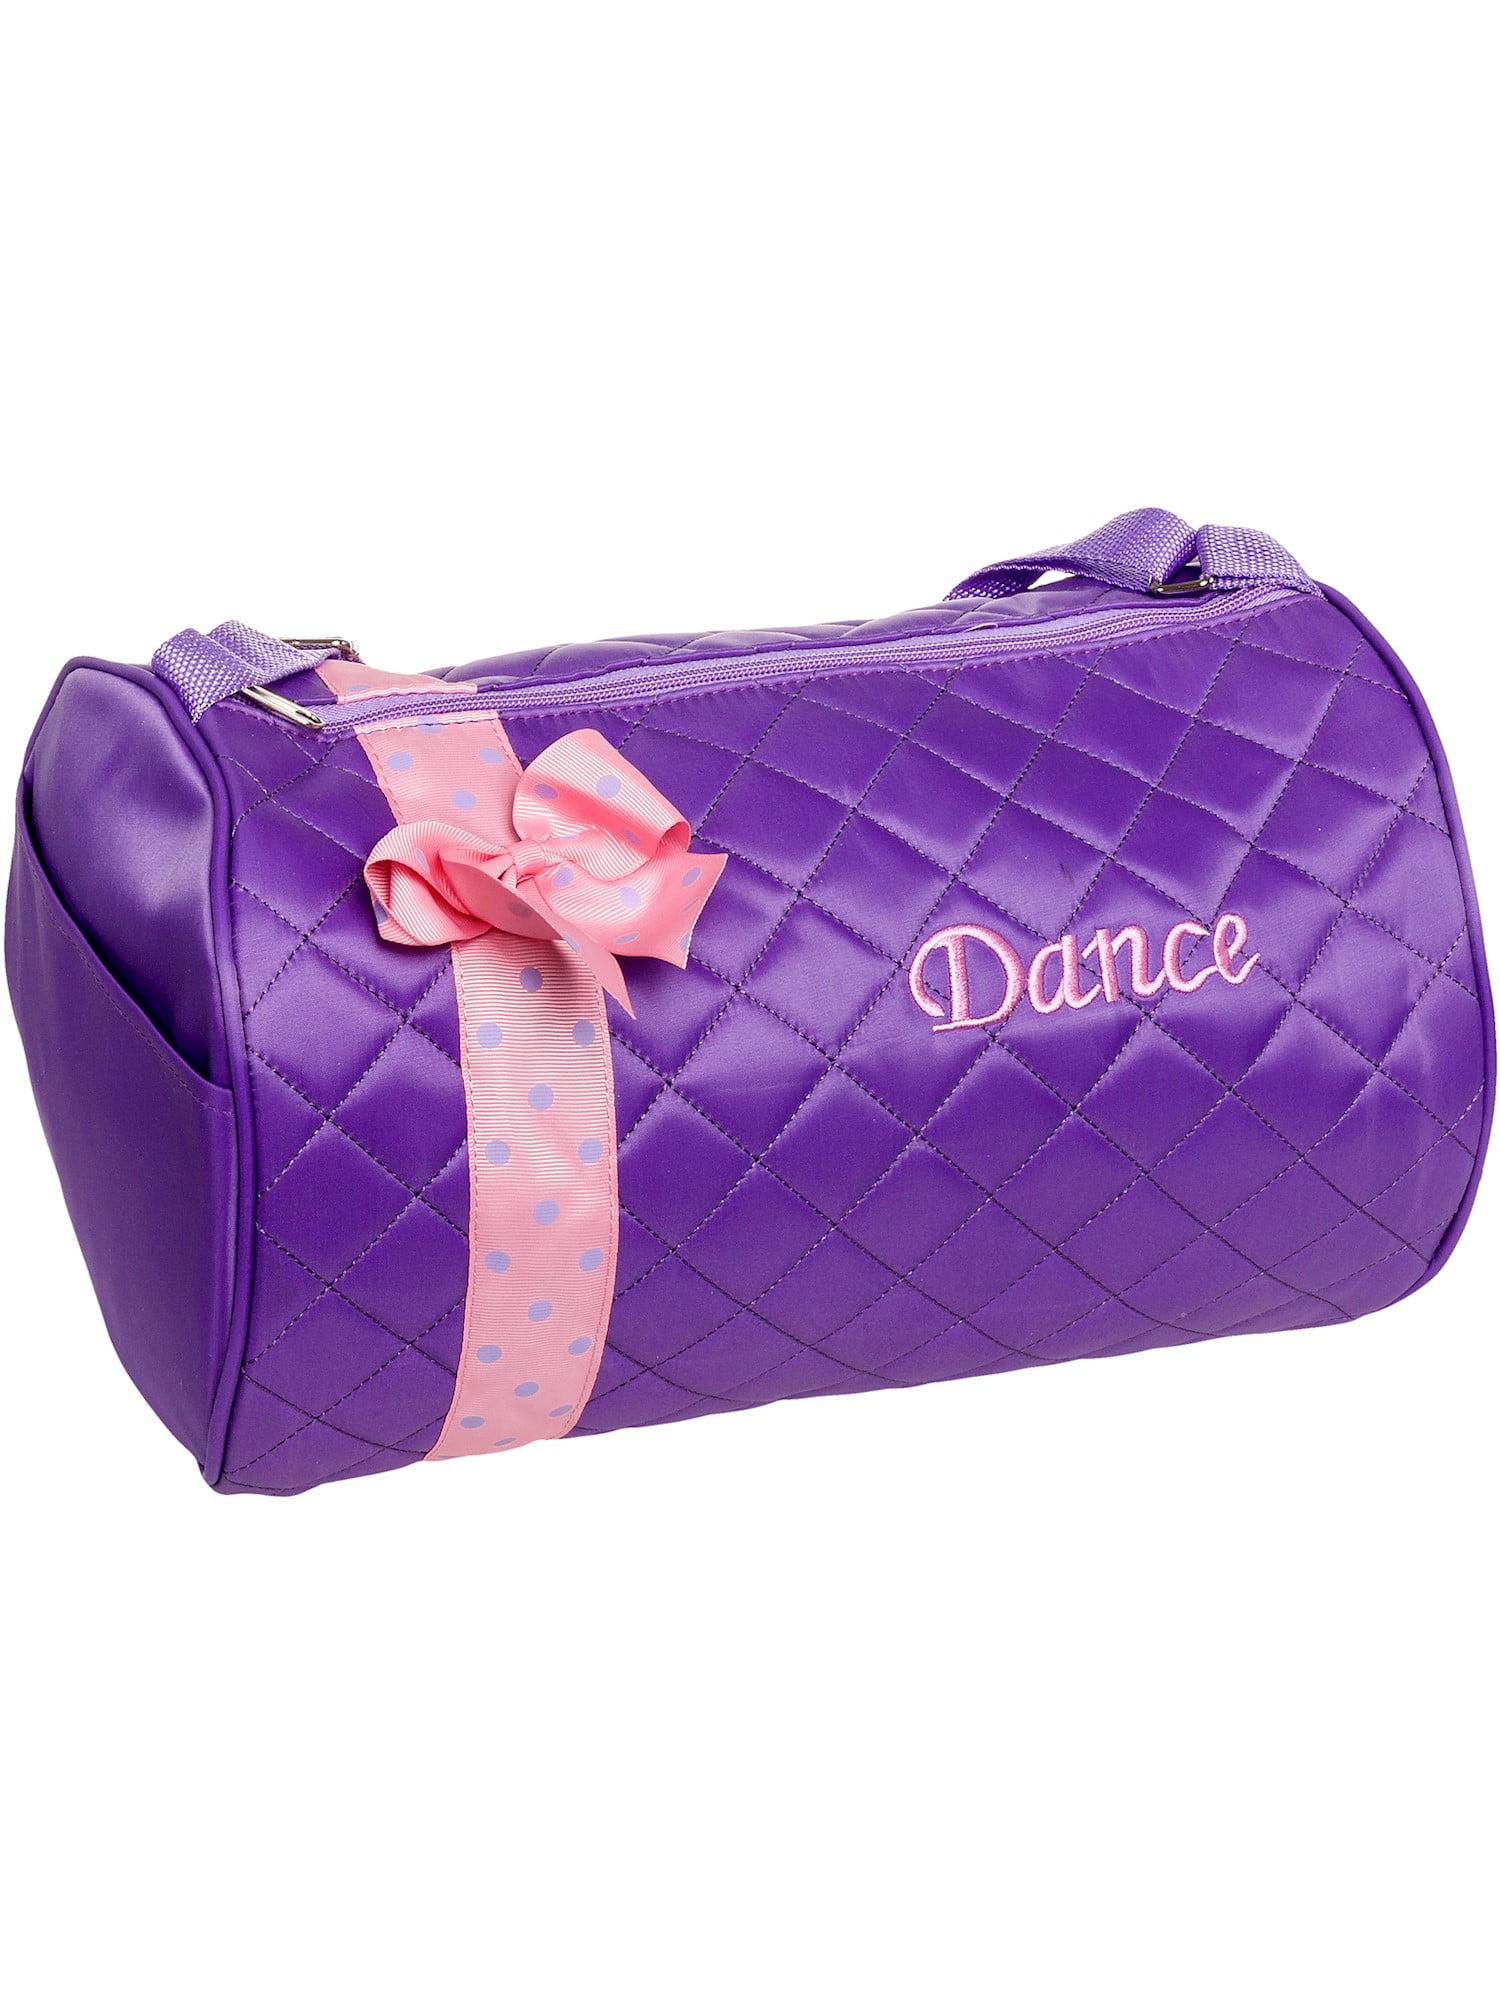 SILVER LILLY NEW Girl Dance Cheer Ballet Duffel Travel Gym Duffle Bag w/ Bow NWT